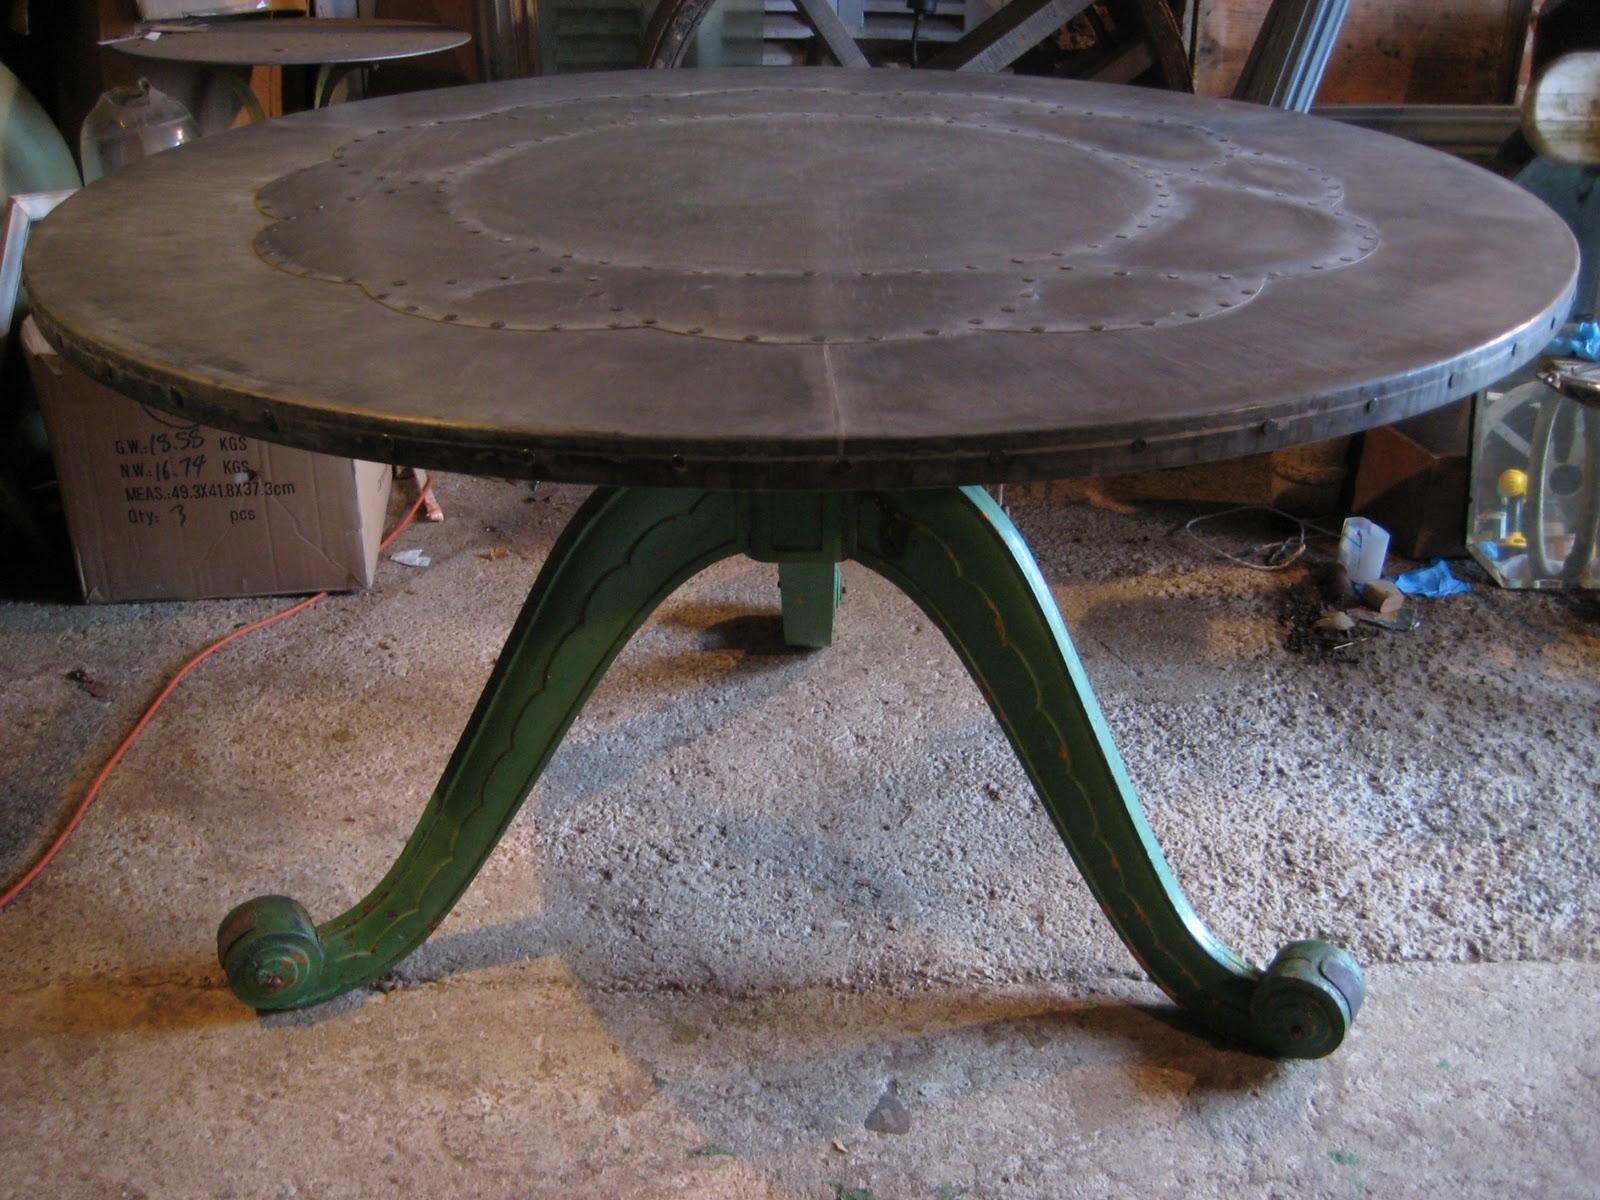 Deballage Designs Circular Table With A Zinc Top Studded Geometric Fl Motif